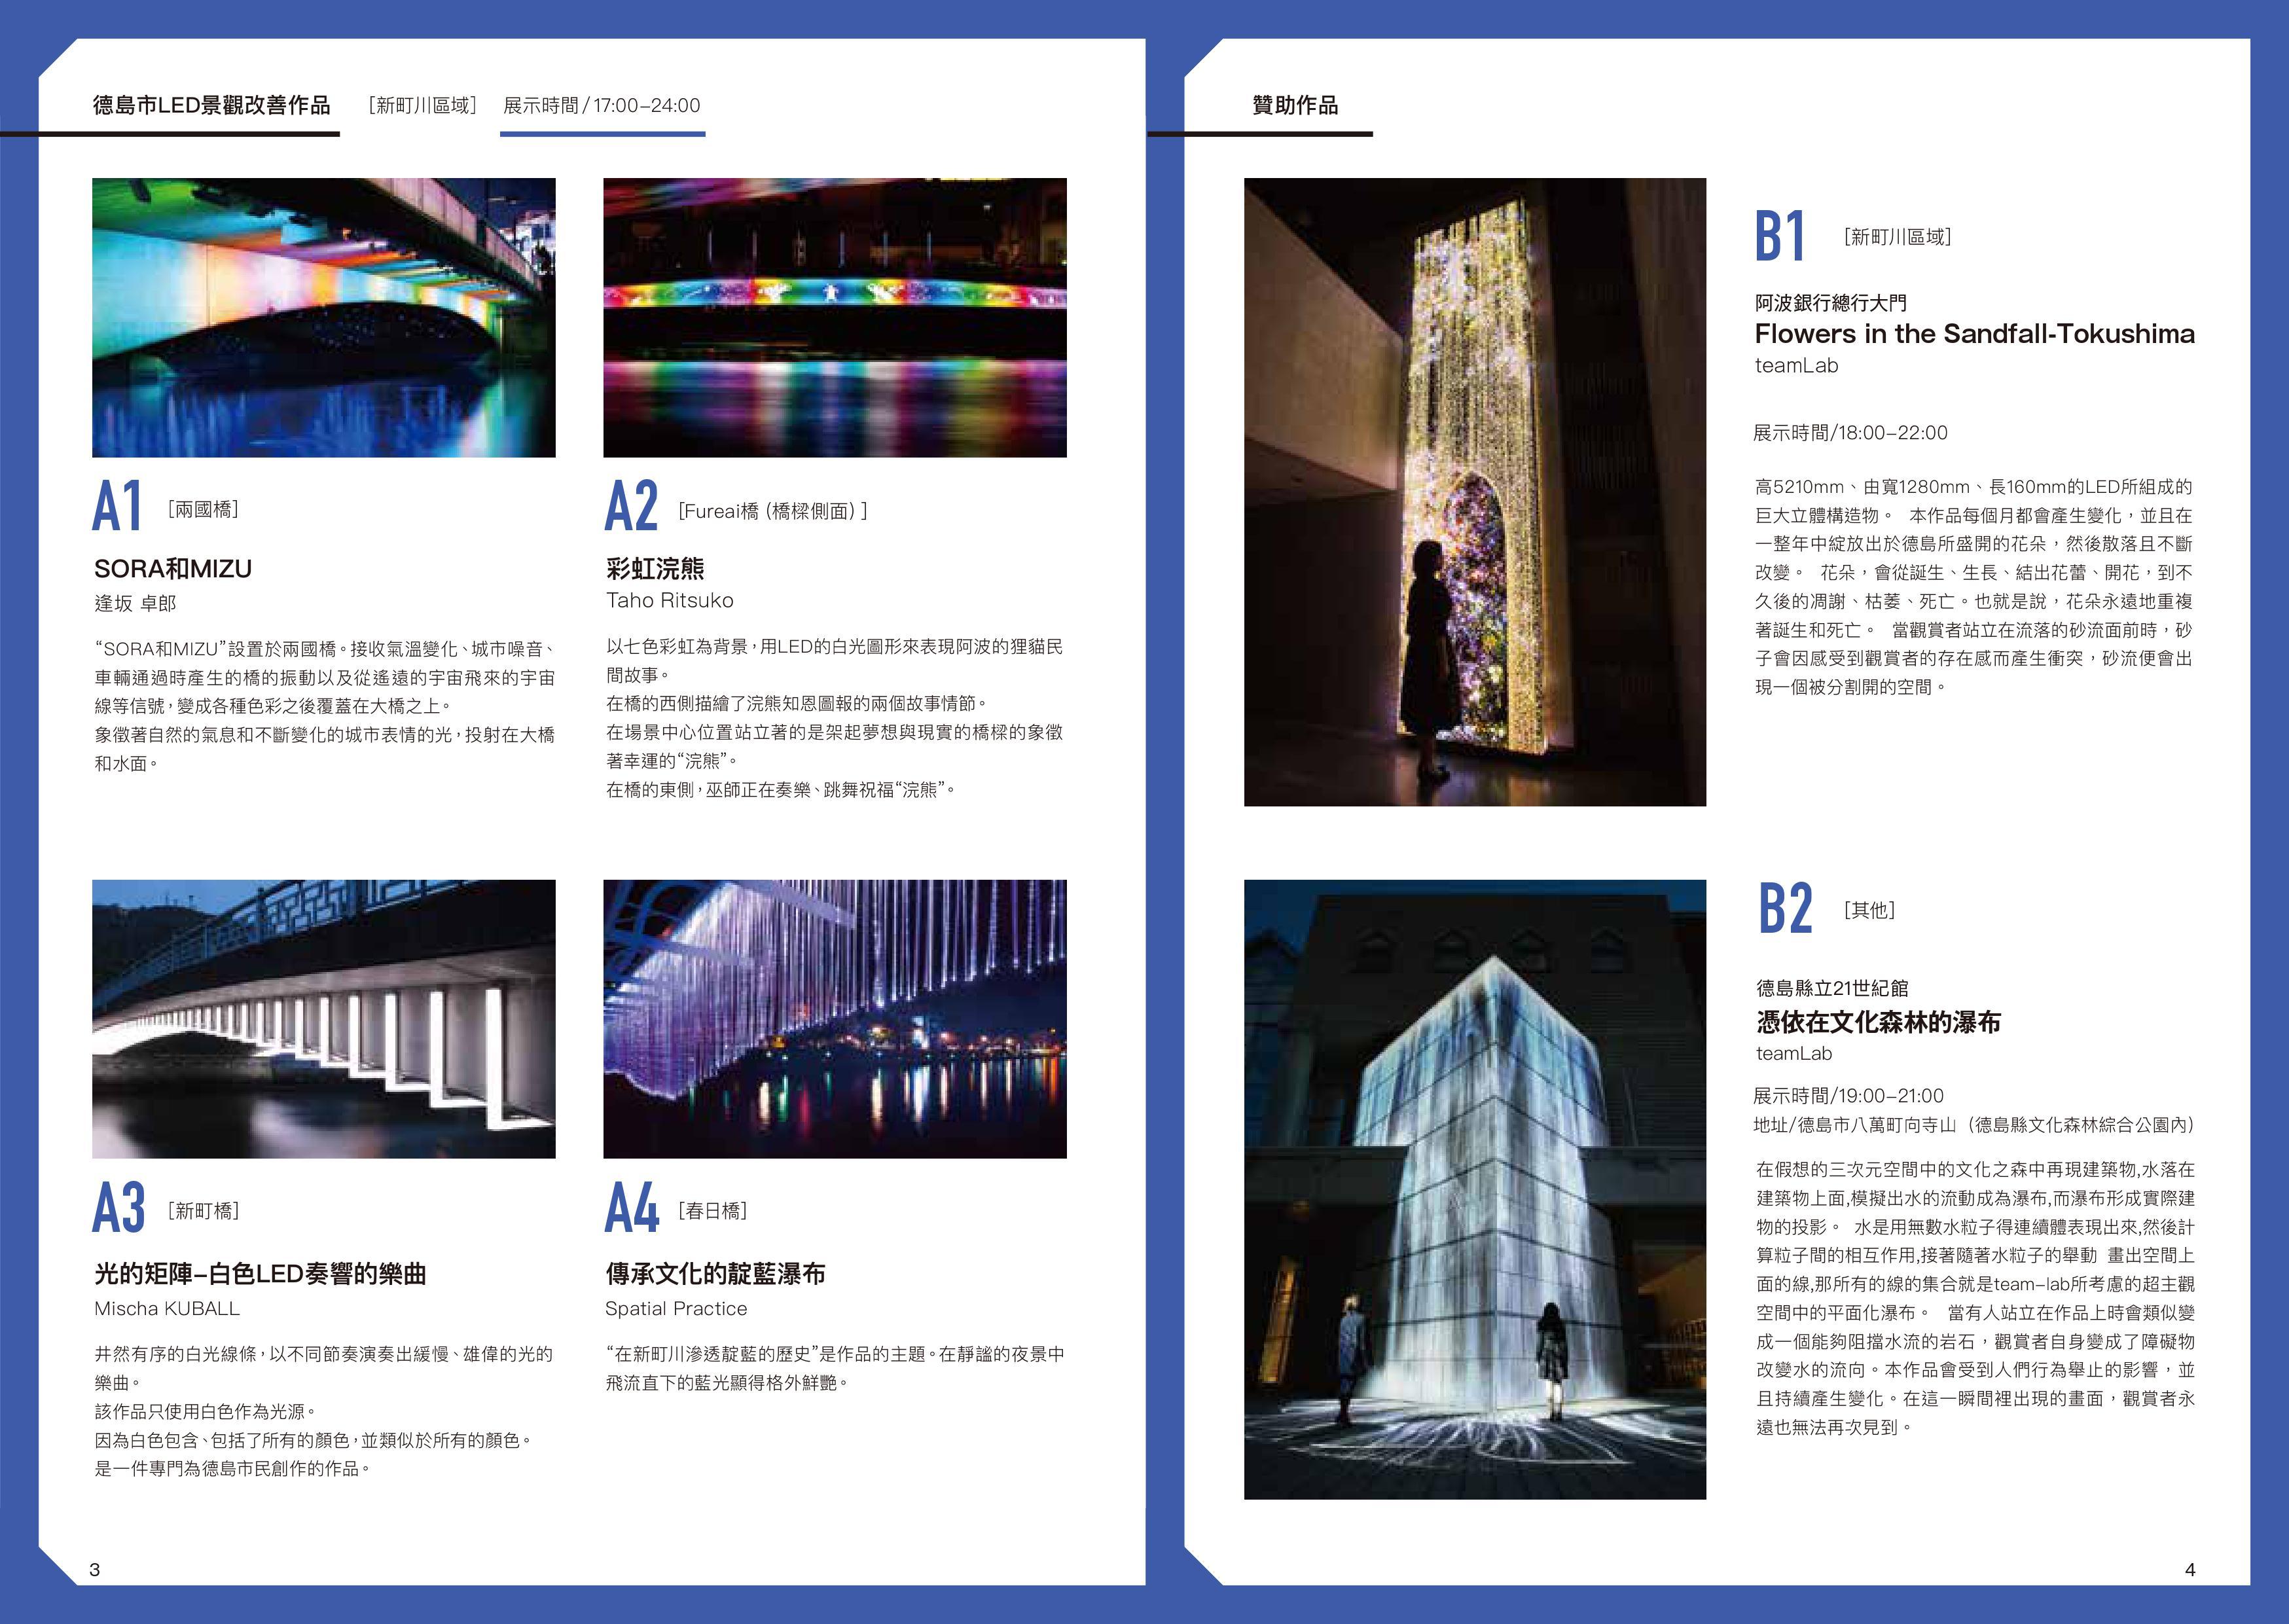 德島LED數碼藝術節|河流與森林的光之祭Tokushima Led Digital Art Festival 2018|期間限定、無料入場